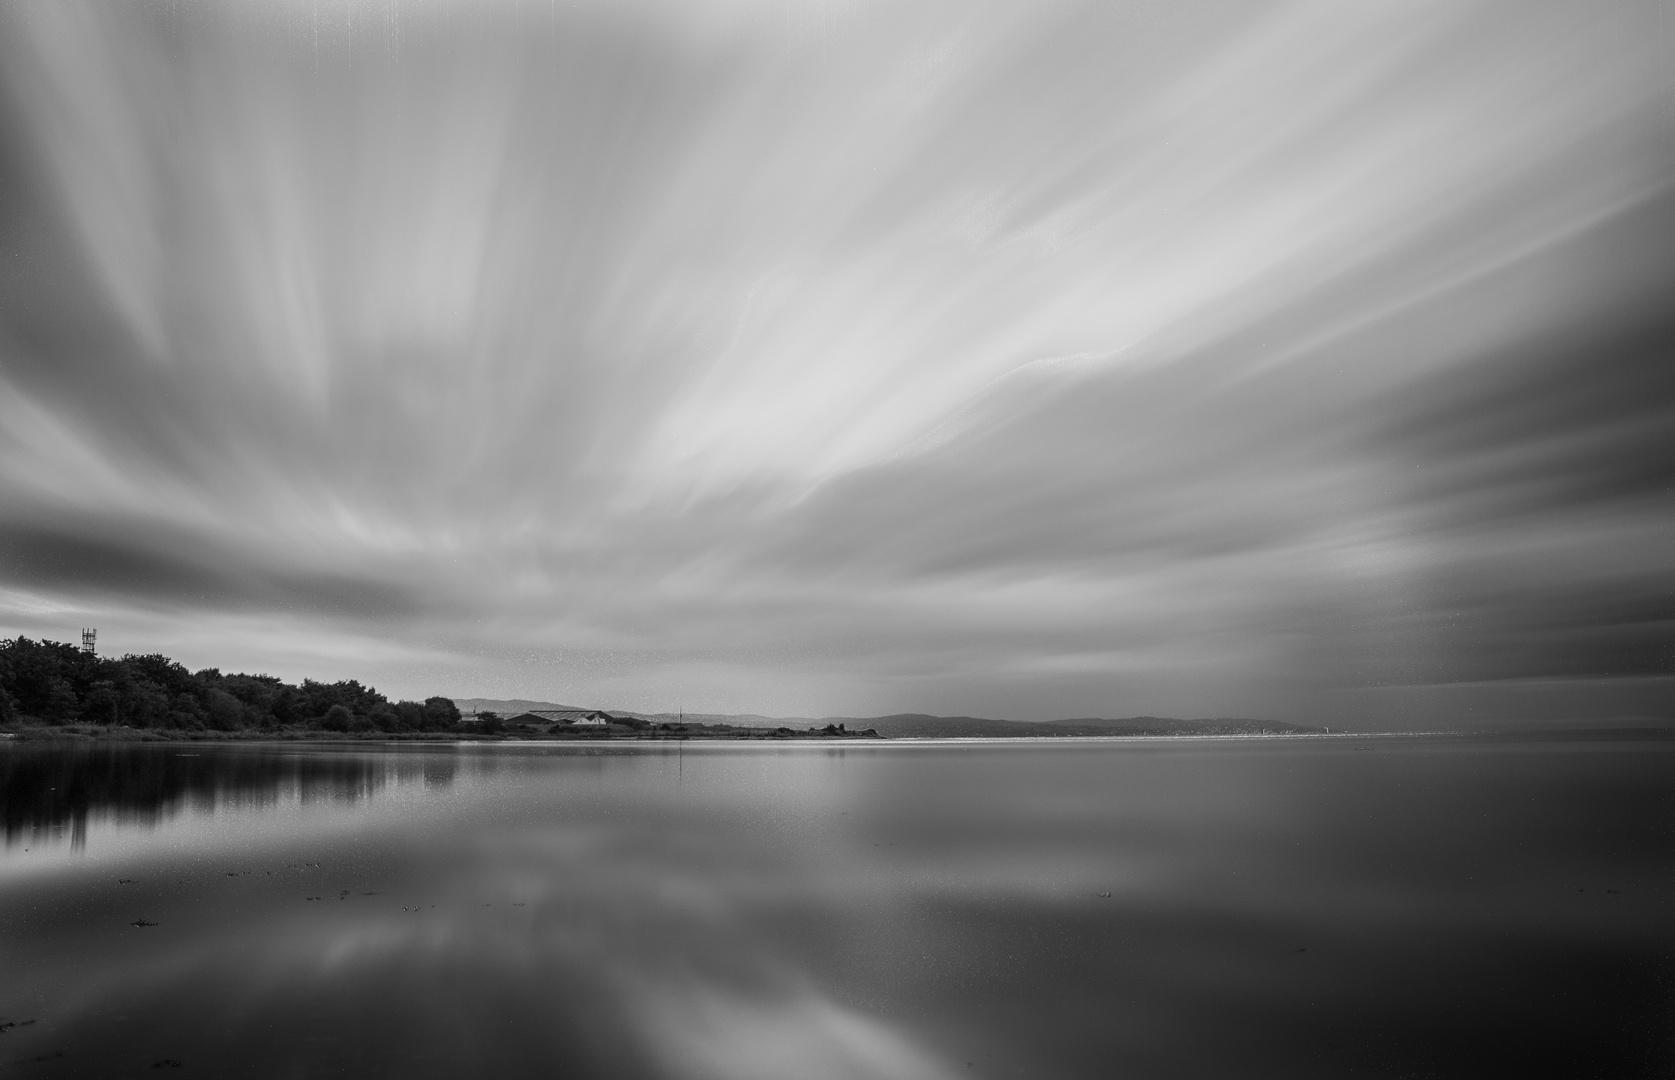 Lough Foyle